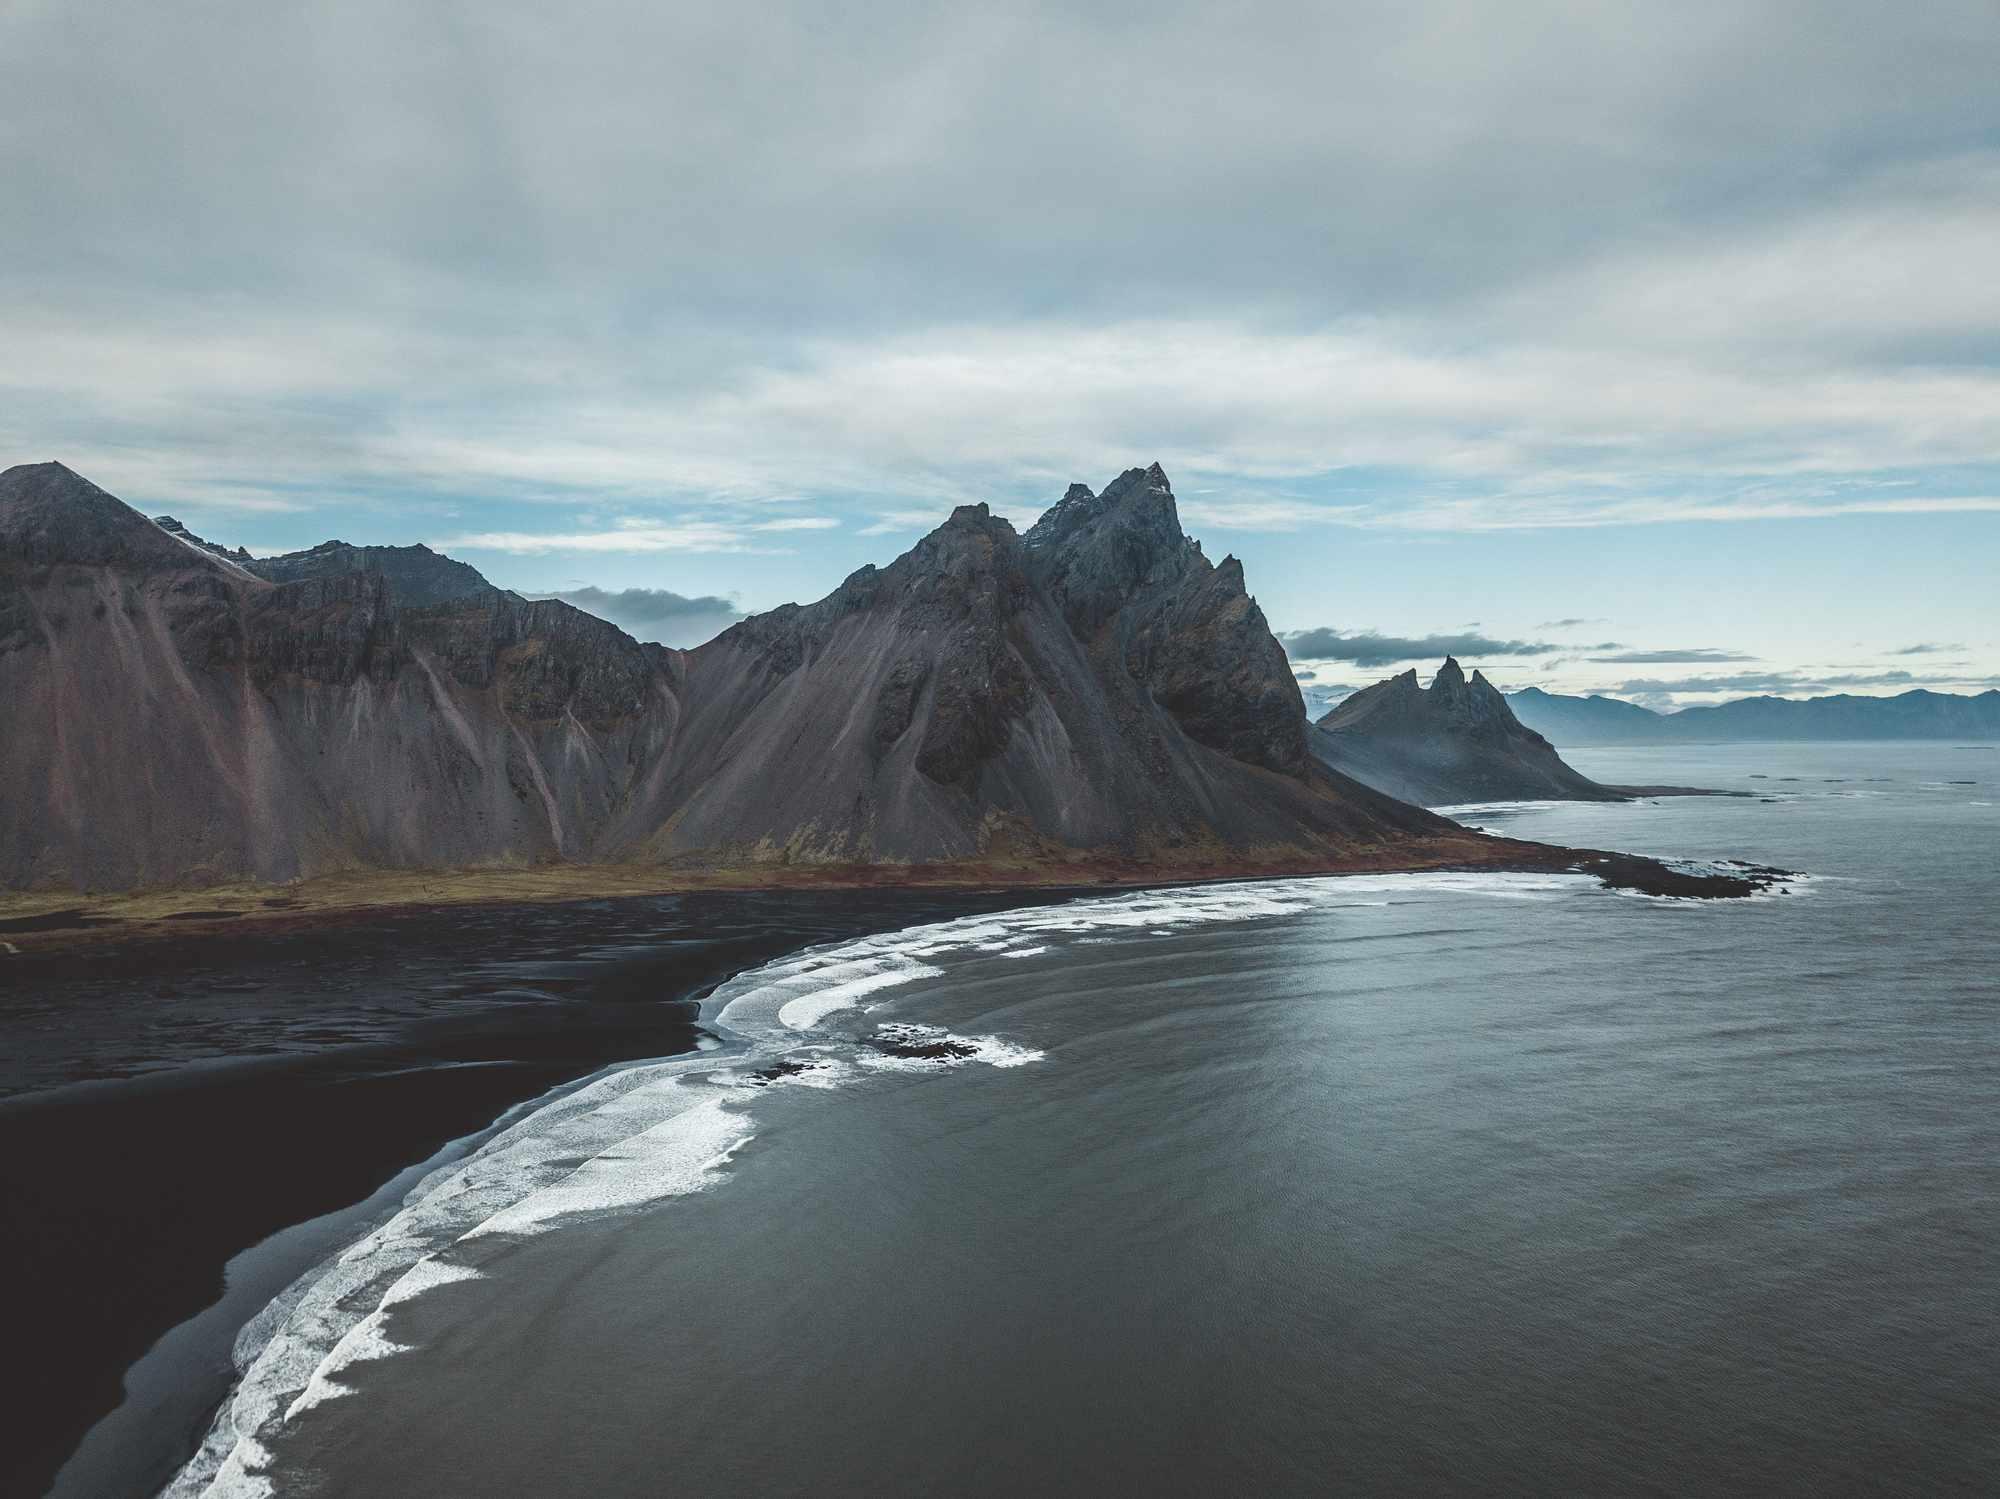 Arena negra en la playa de Stokksnes en Islandia